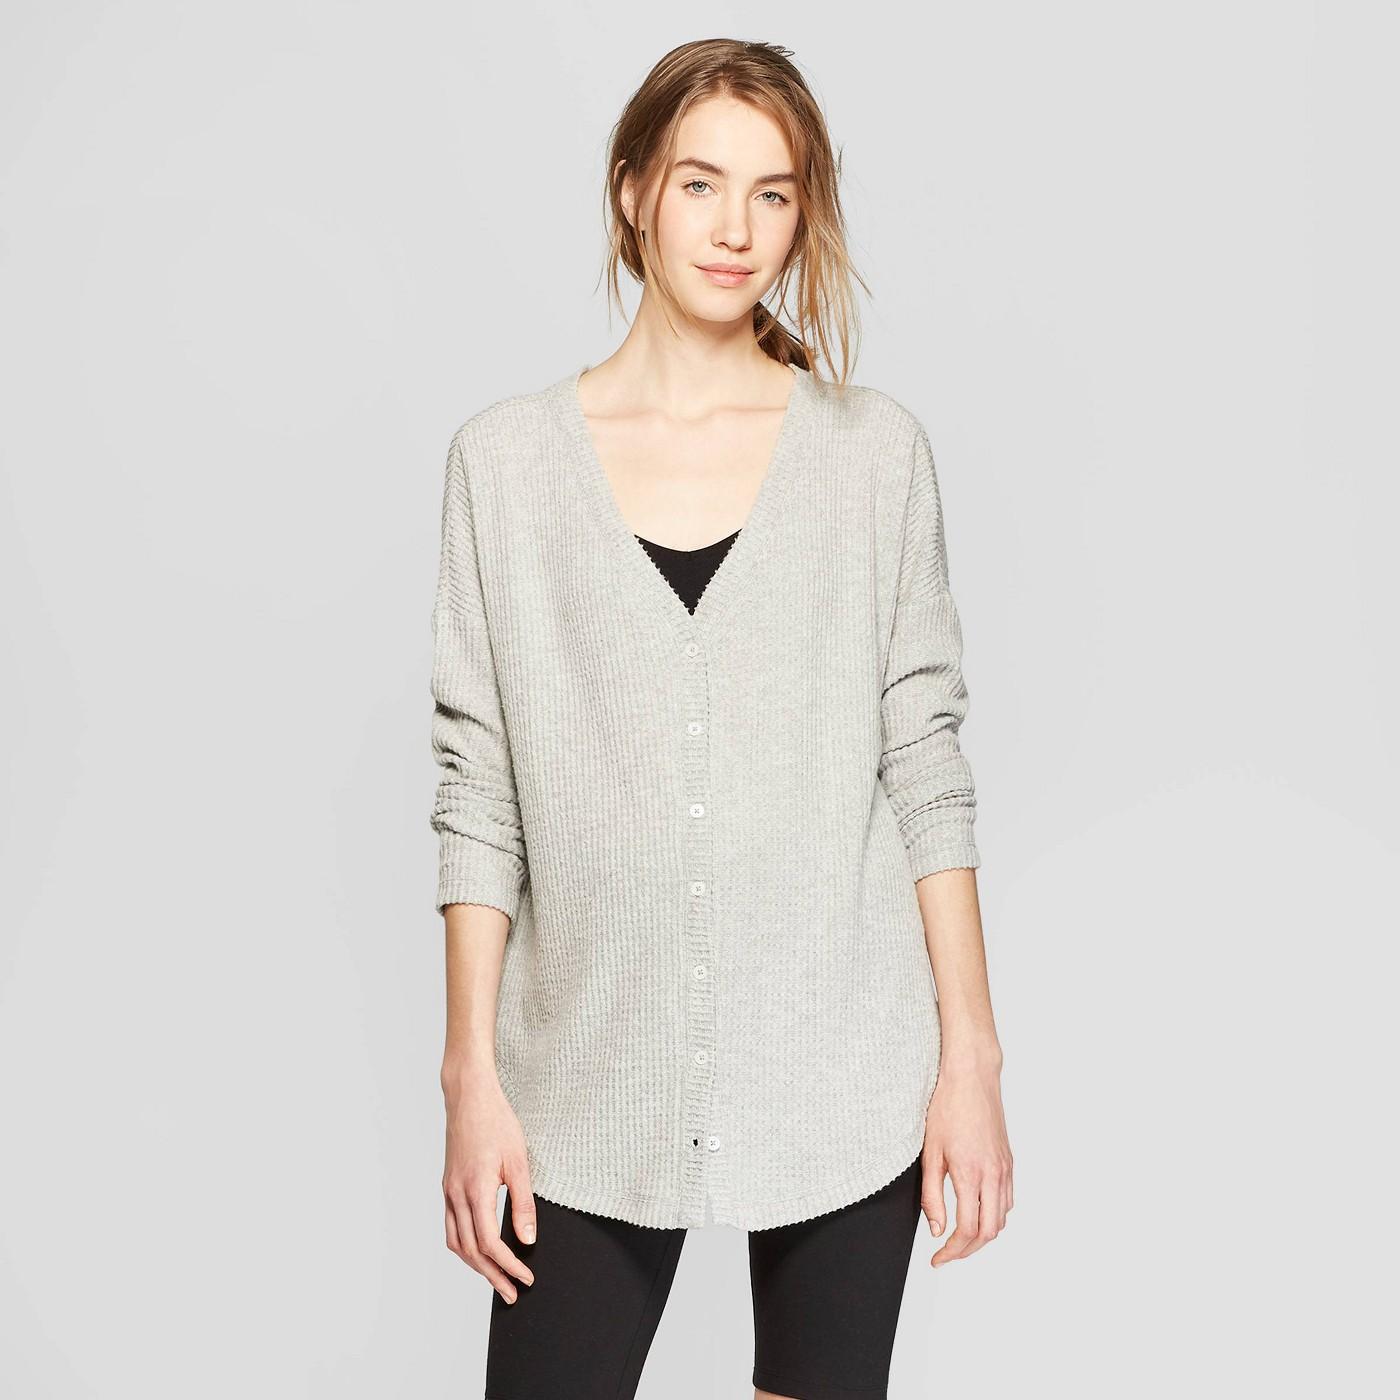 Women's Long Sleeve Waffle Button-Up Lounge Sweatshirt - Colsie™ Heather Gray - image 2 of 3